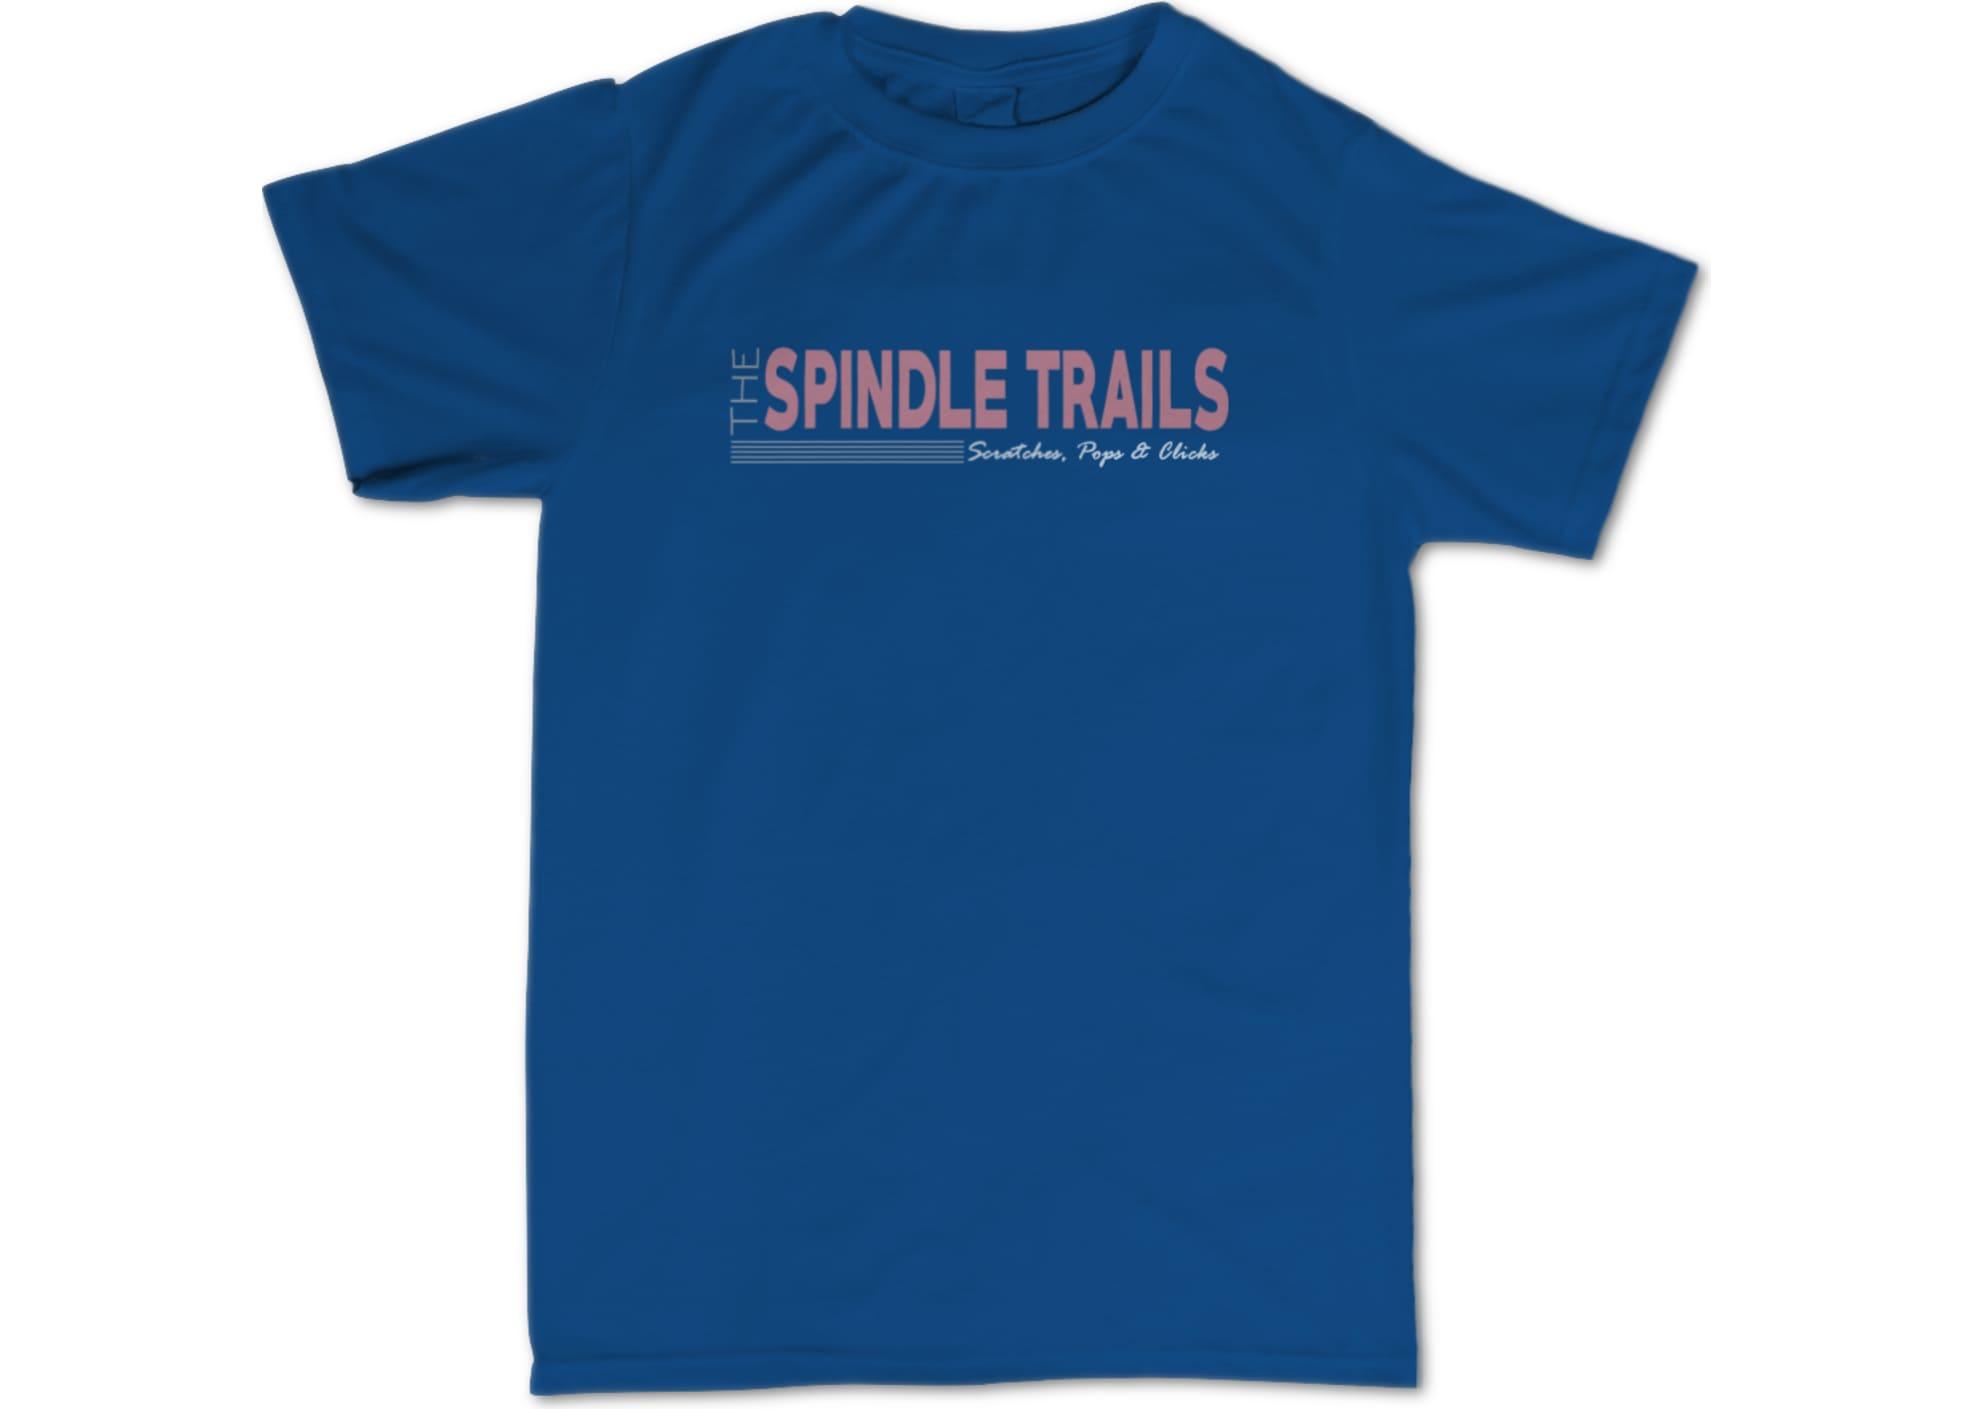 Spindle trails scratches pops   clicks   blue 1473083748